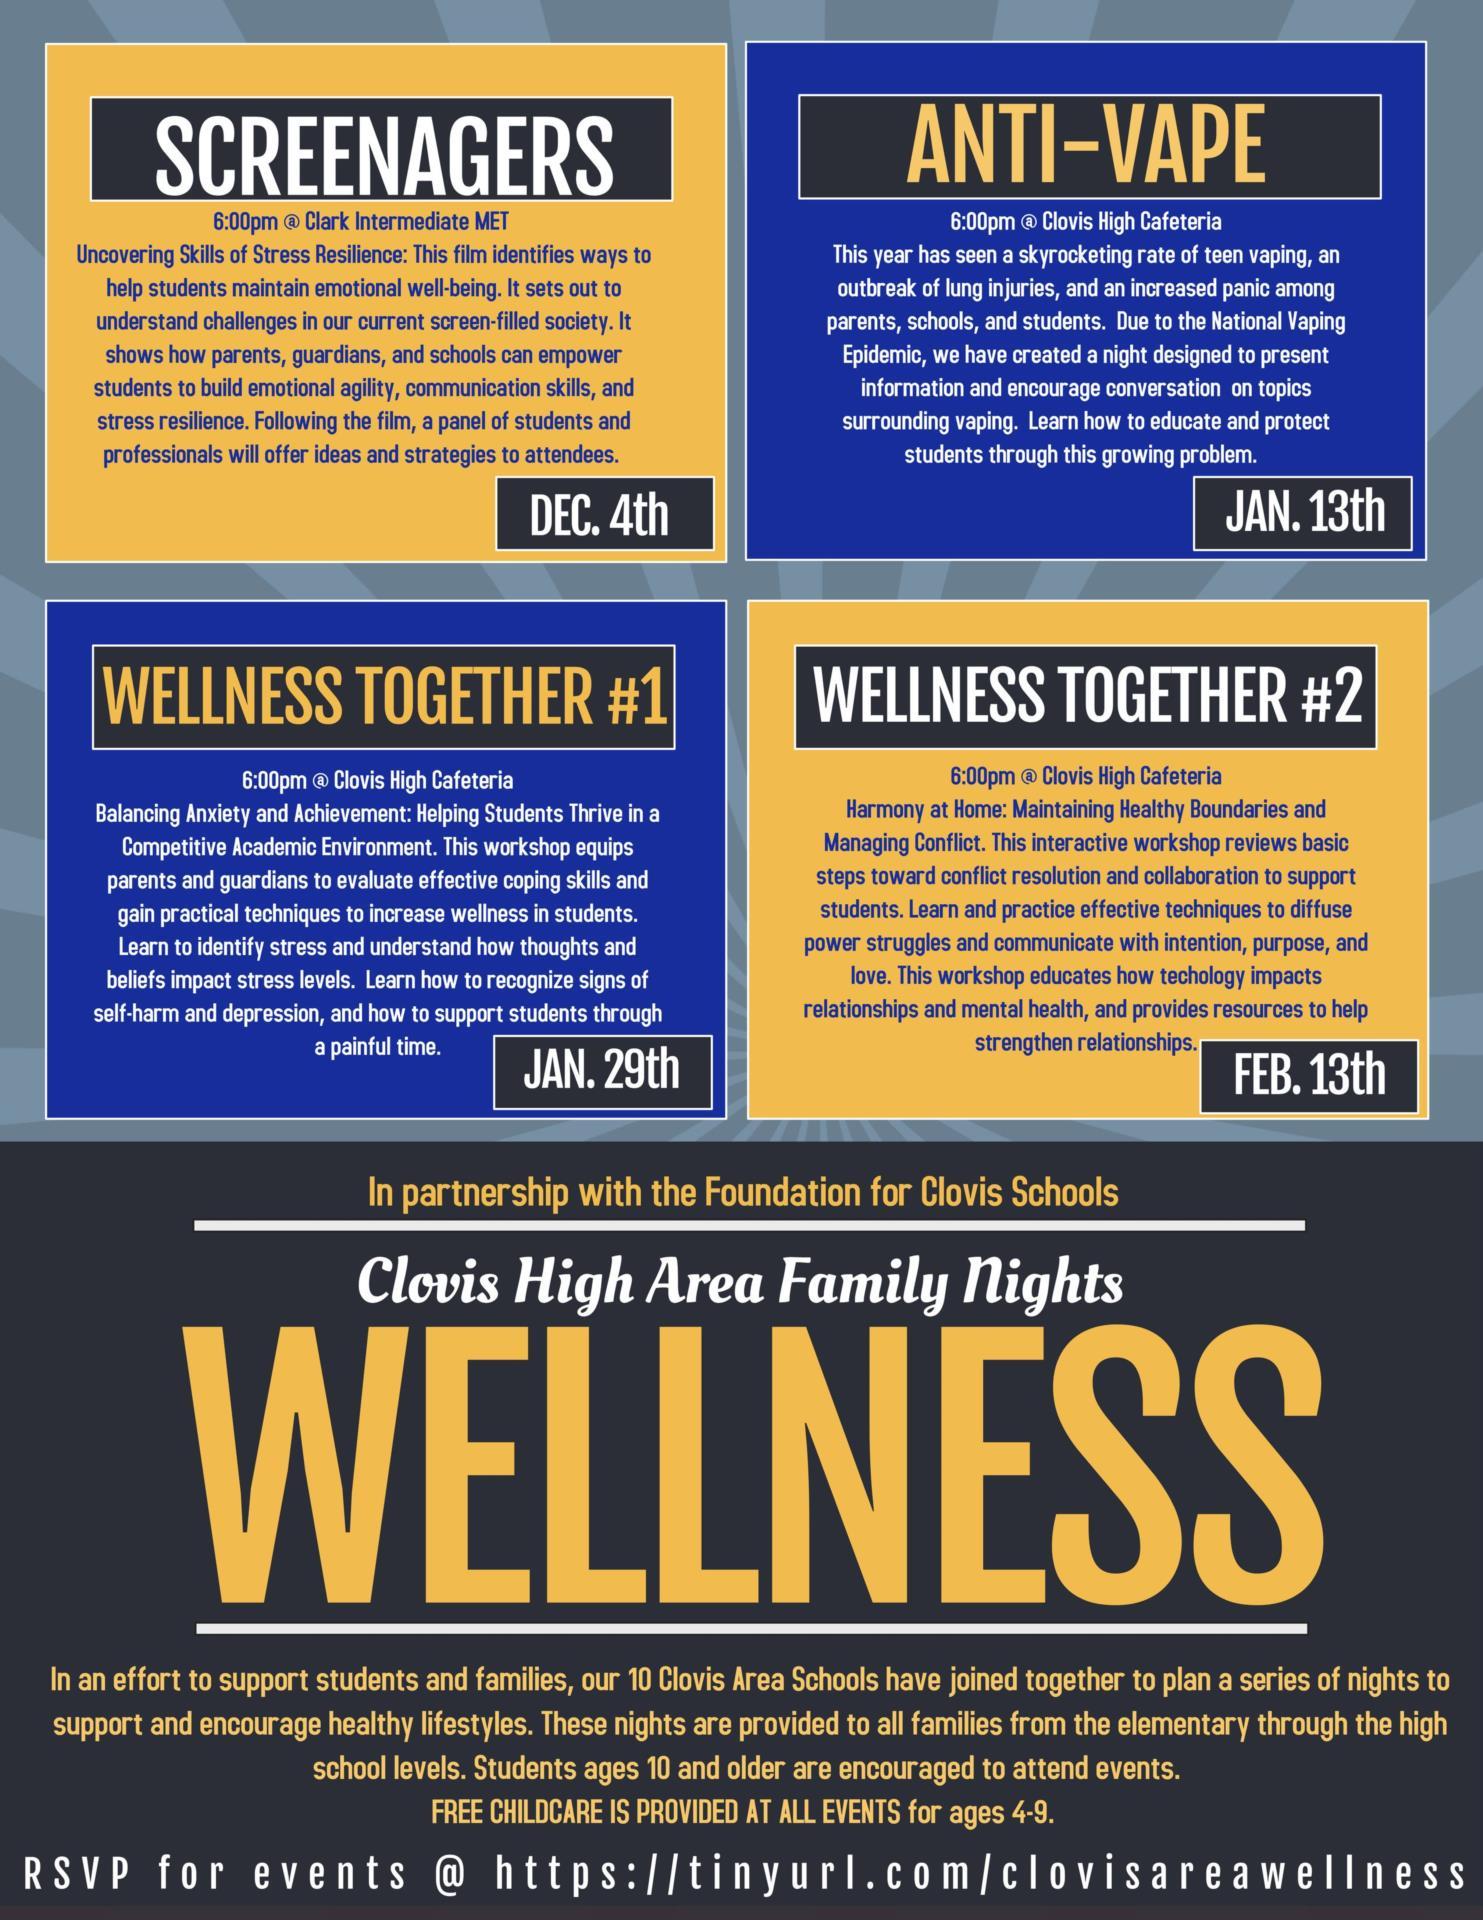 Clovis Area Wellness Nights Flyer